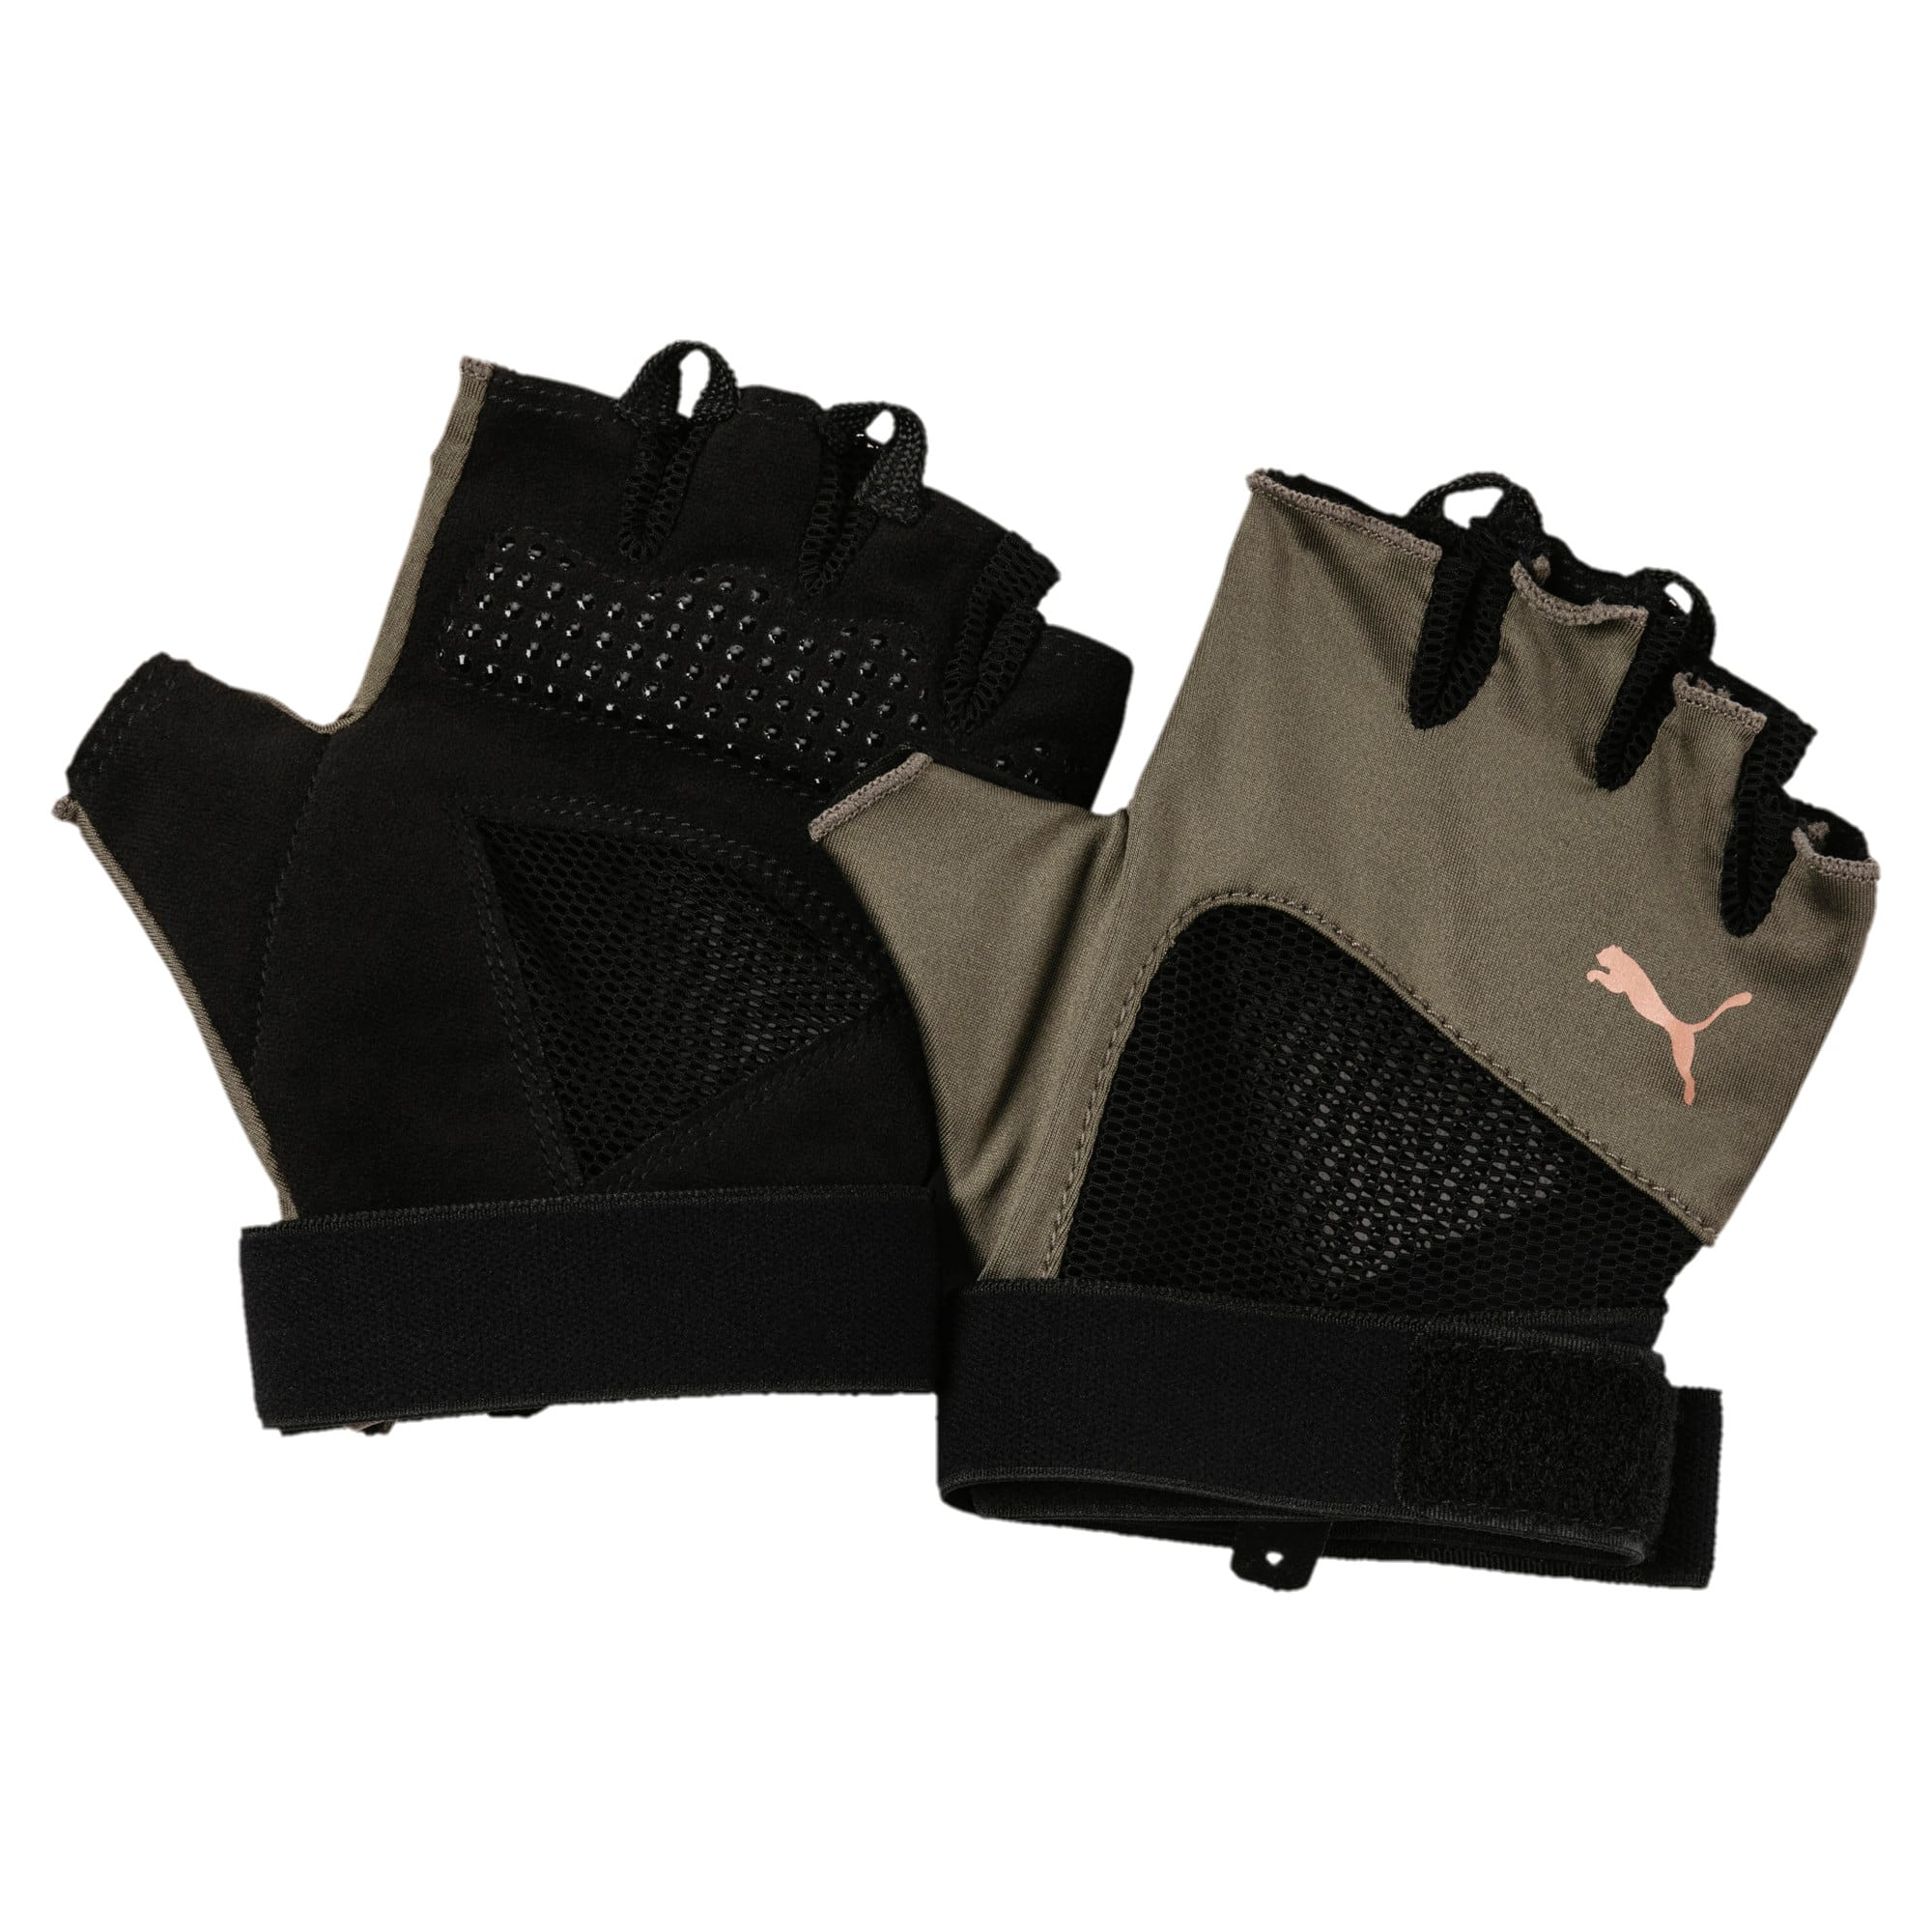 Thumbnail 1 of Active Training Women's Combat Training Gloves, Olive Night-Puma Black, medium-IND